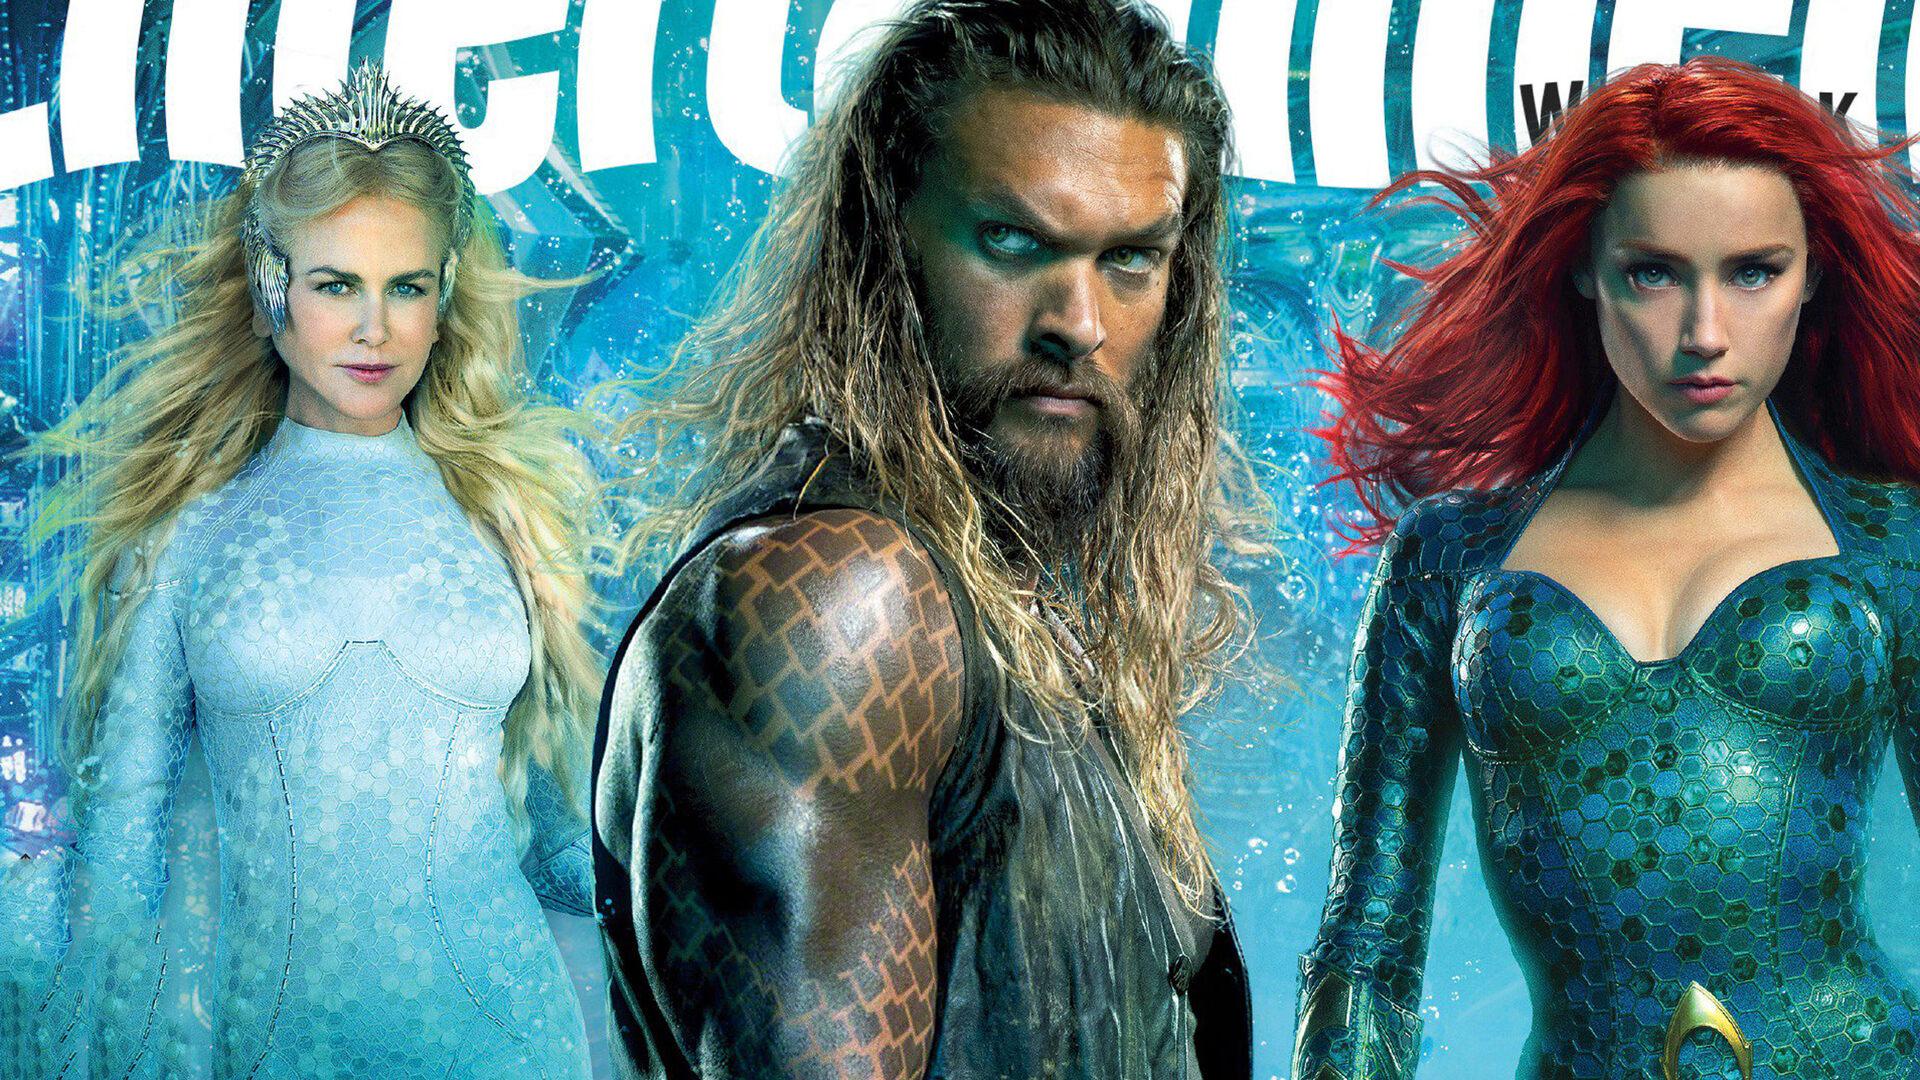 1920x1080 2018 Aquaman Movie Laptop Full Hd 1080p Hd 4k Wallpapers